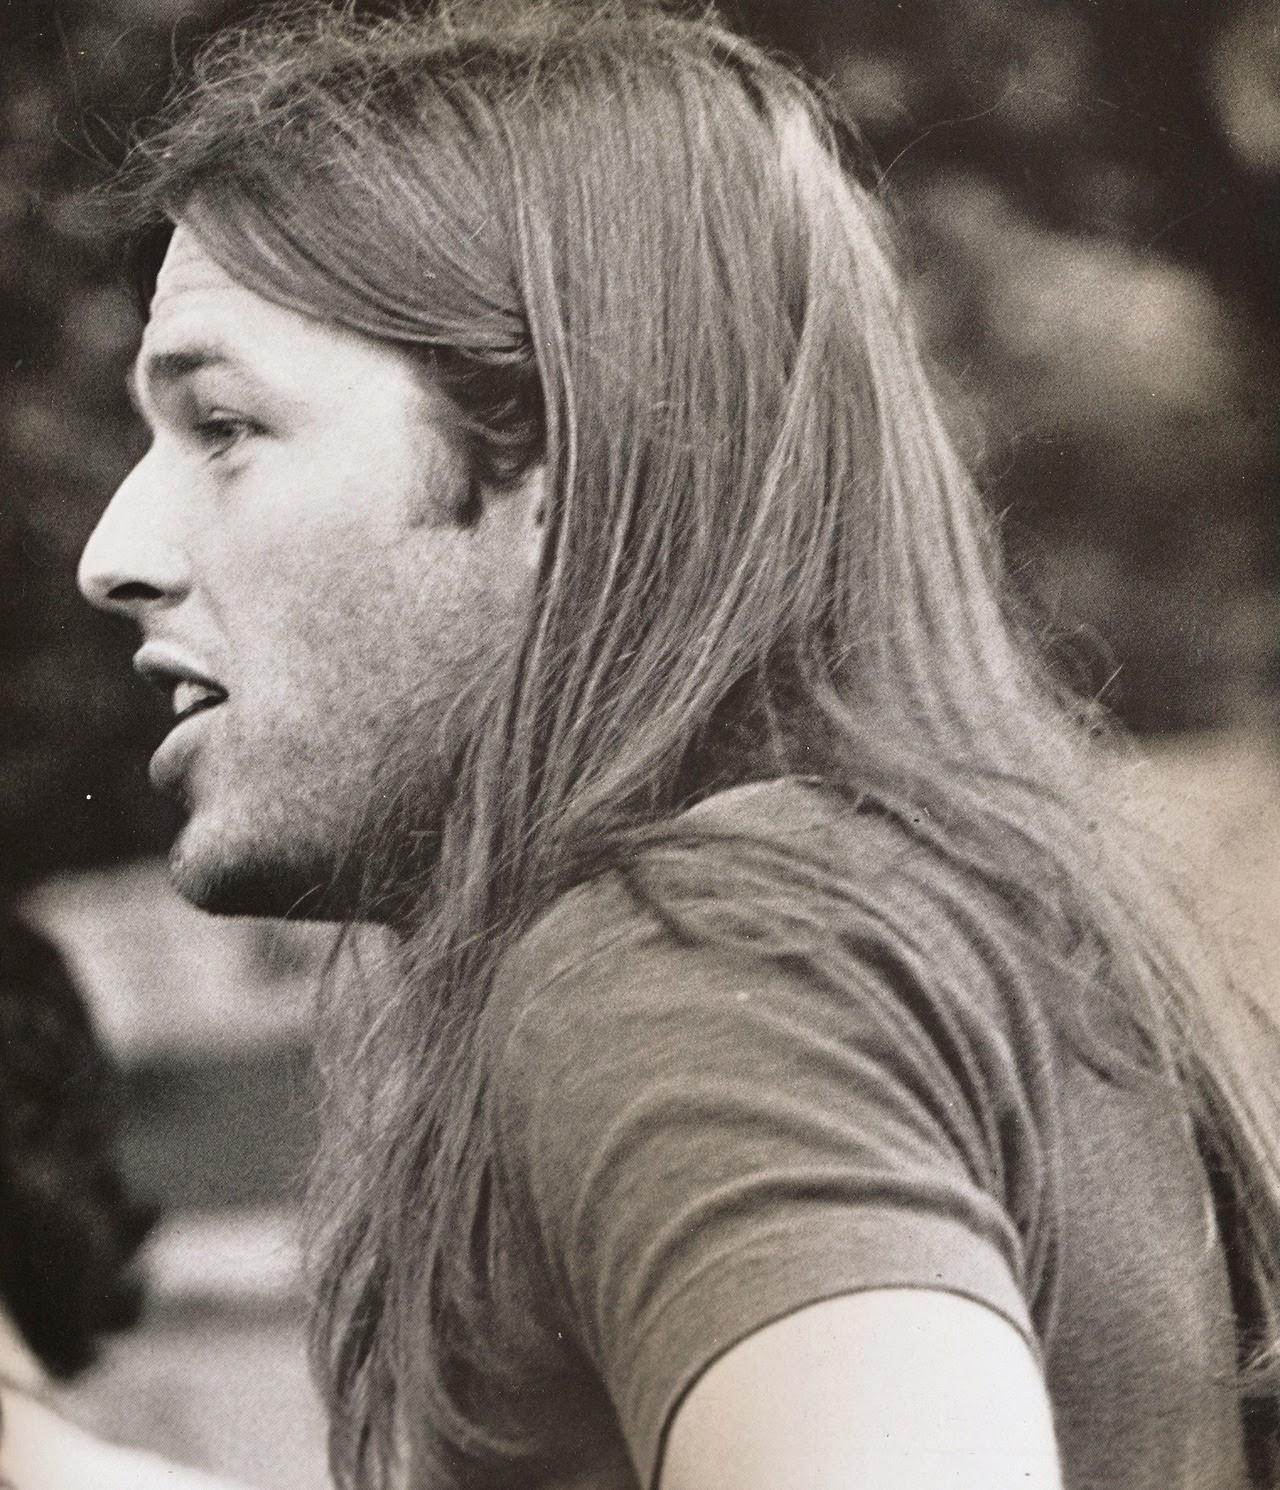 Syd Barrett Quote Wallpaper David Gilmour Quotes Quotesgram